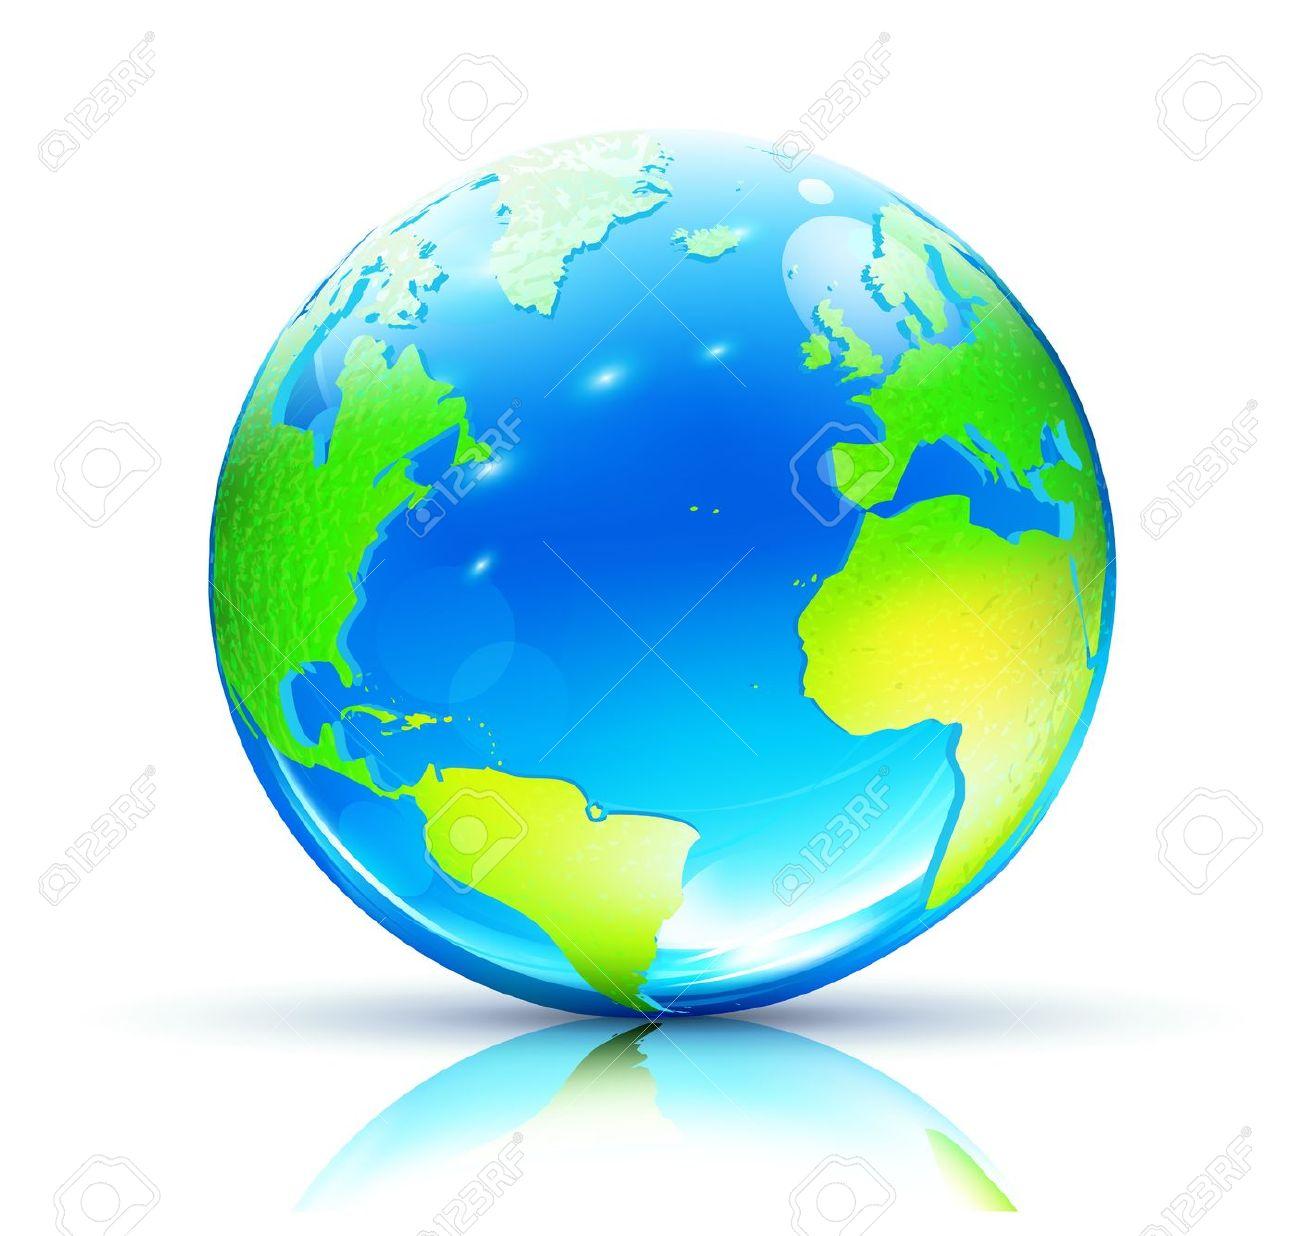 World globe map clipart graphic free Transparent world clipart - ClipartFest graphic free